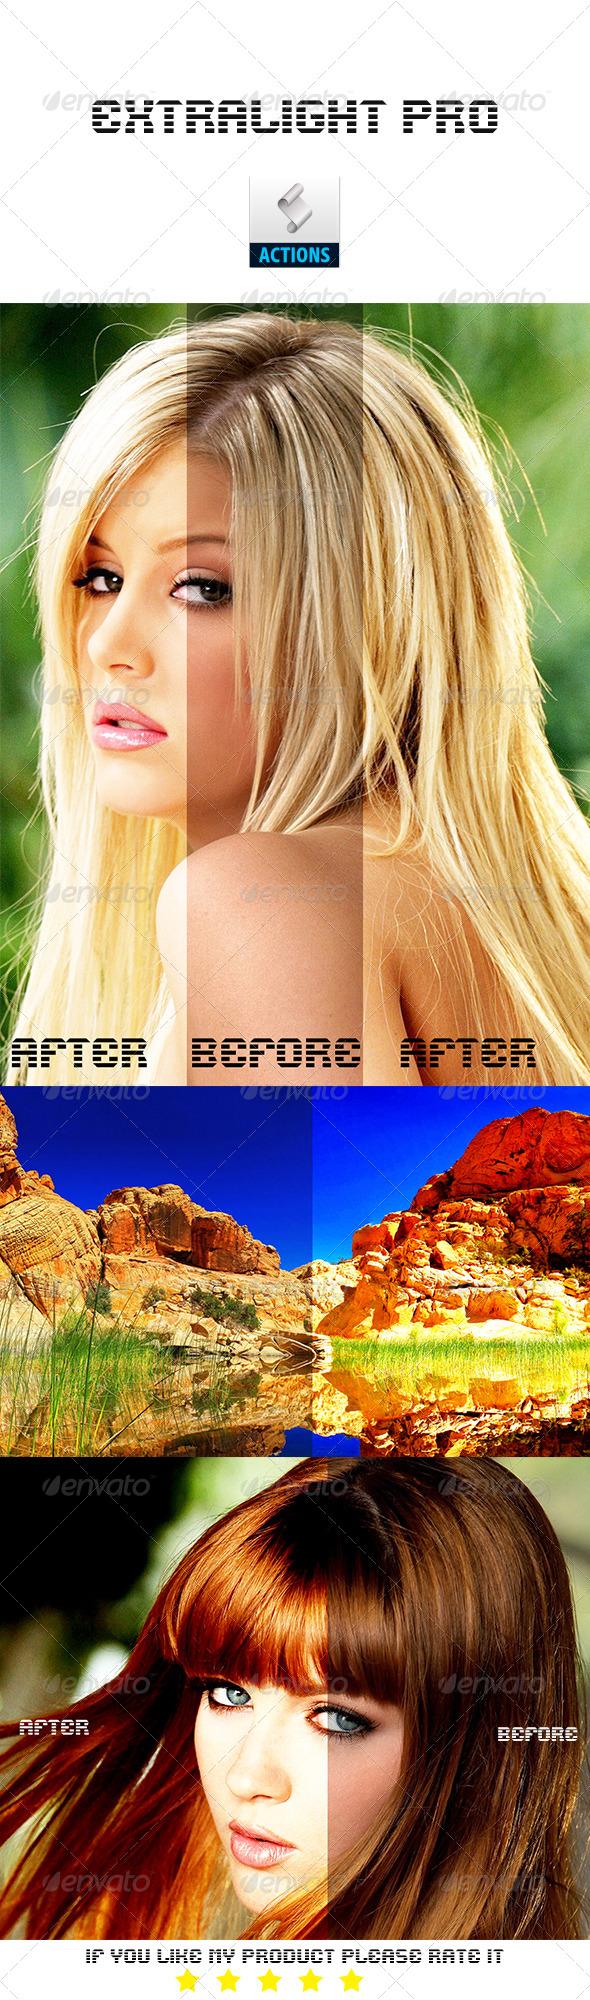 GraphicRiver Extralight Pro Photoshop Action 8331373